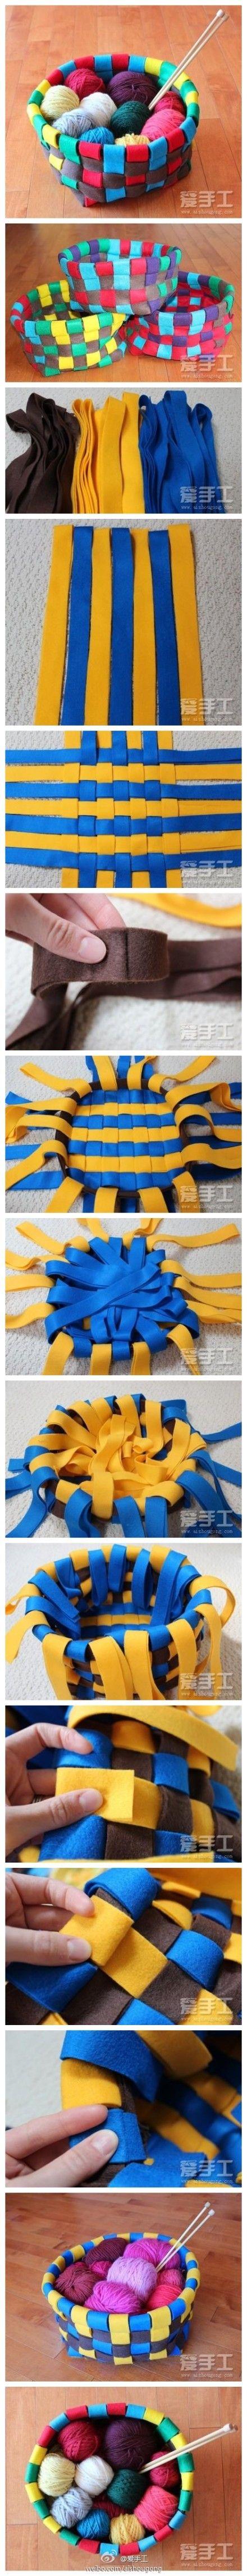 Cloth Basket DIY Projects   UsefulDIY.com